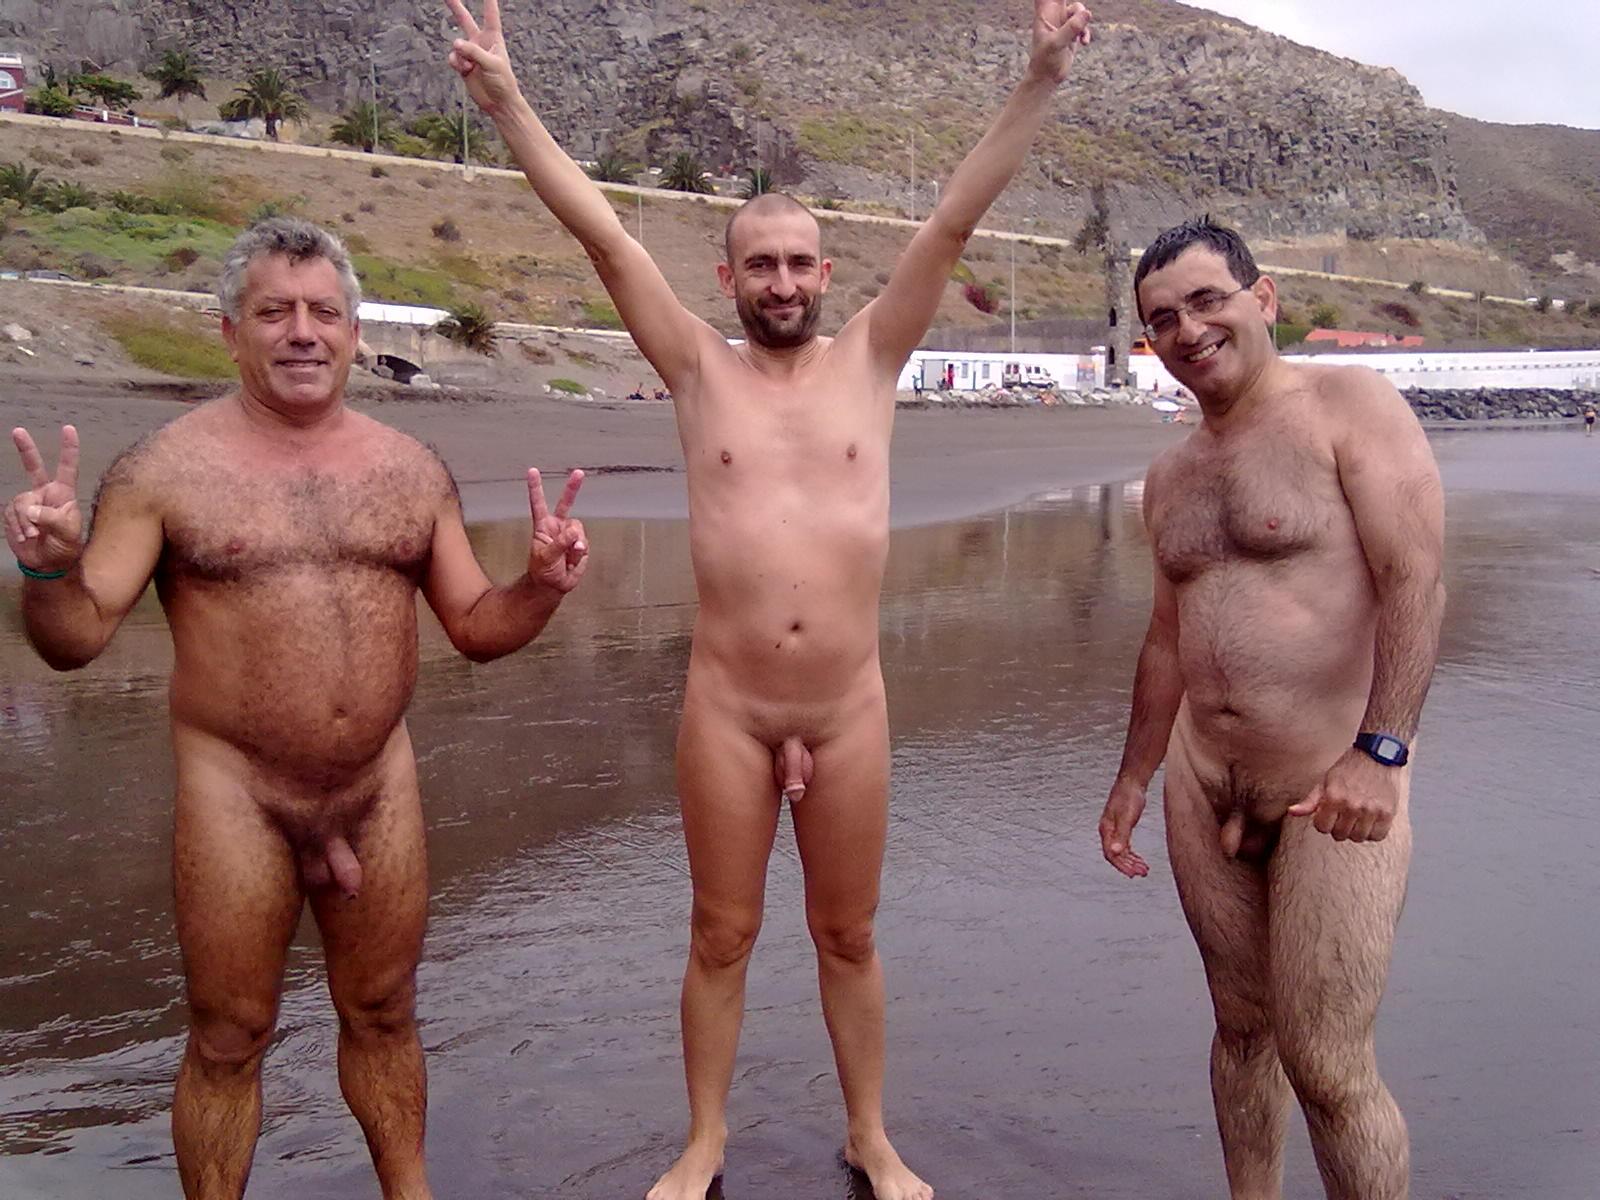 картинки голых мужчин и голых женщин